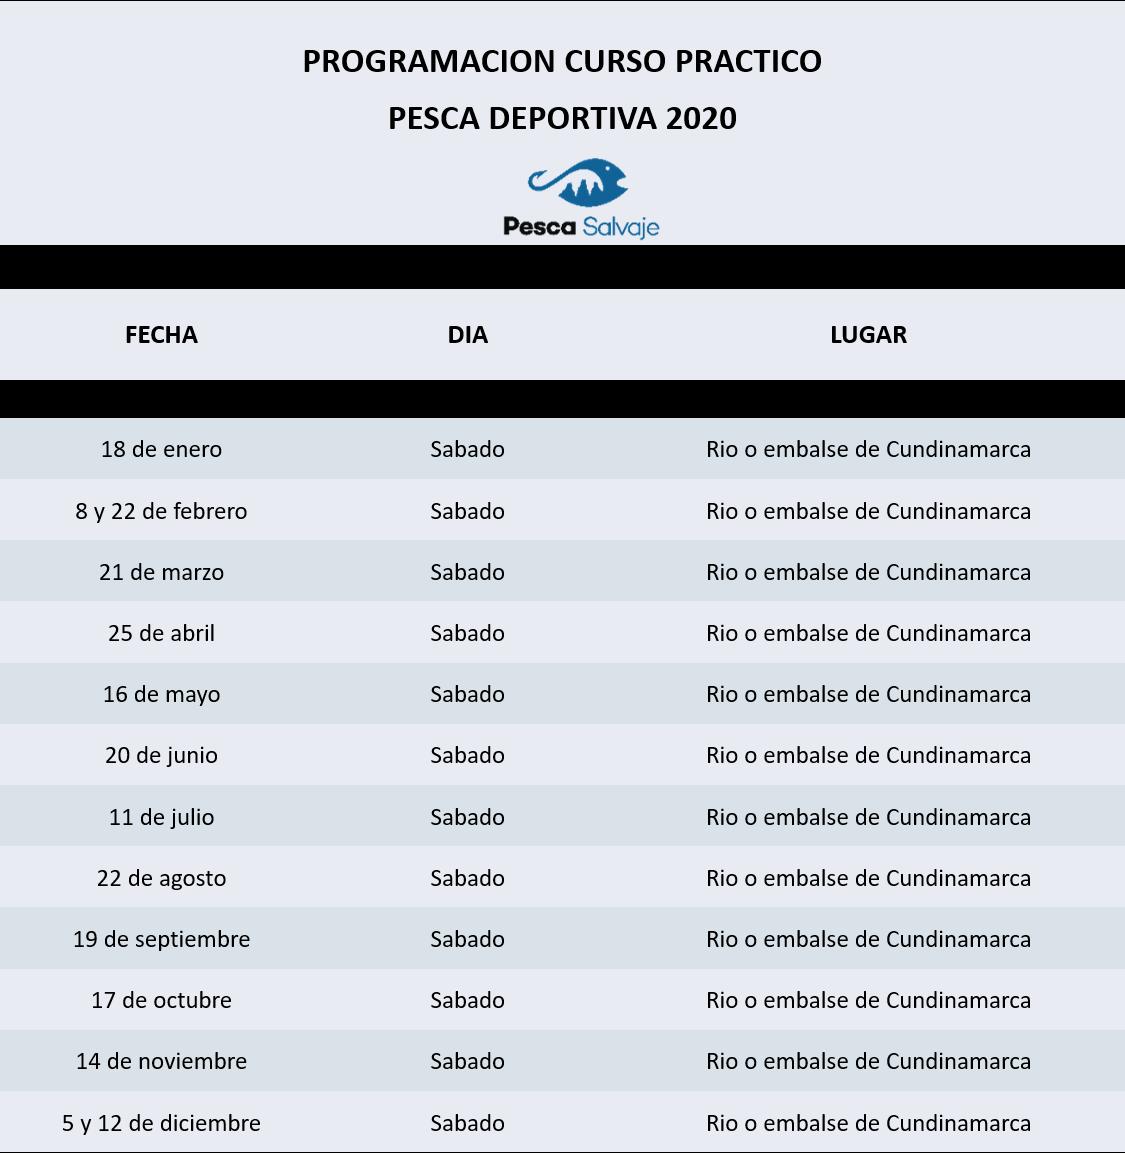 progrmacion_curso_de_pesca_deportiva_2020